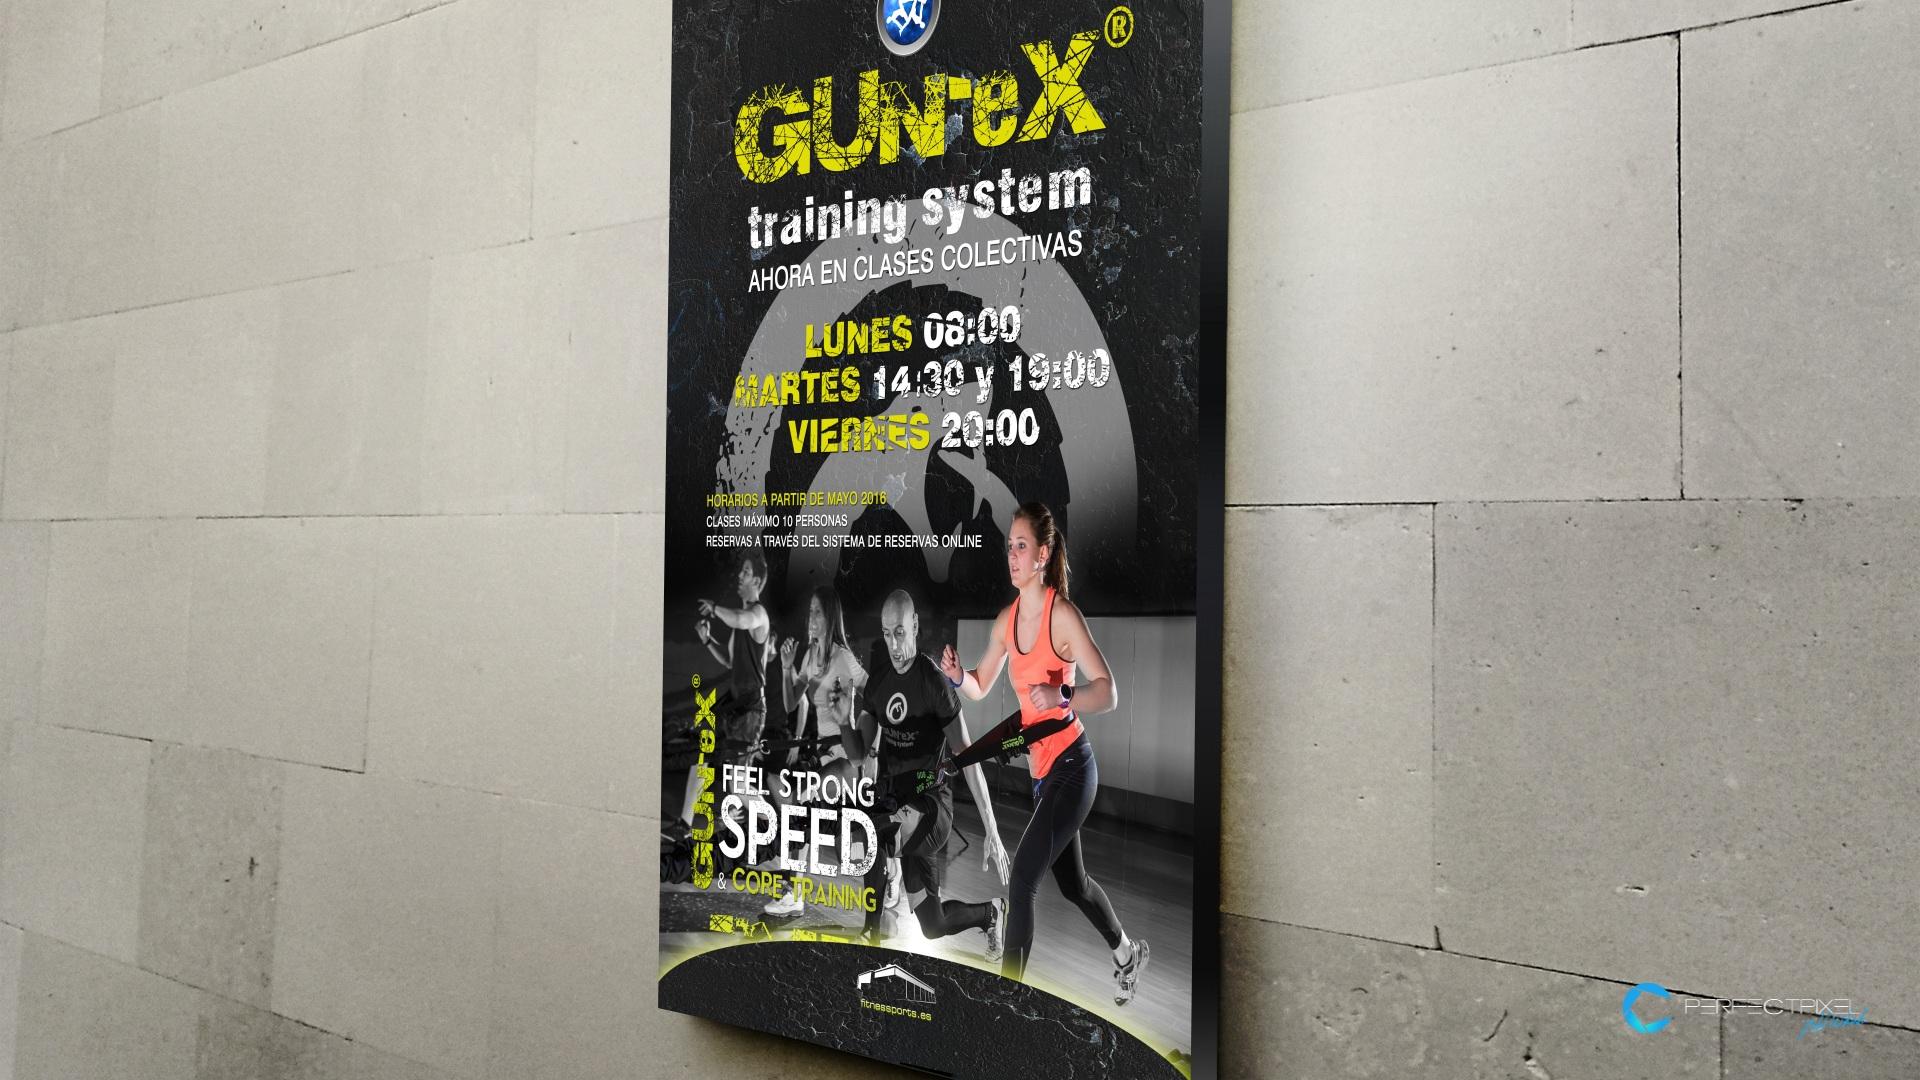 Gun-ex Training System Fitness Sports Valle las CAñas